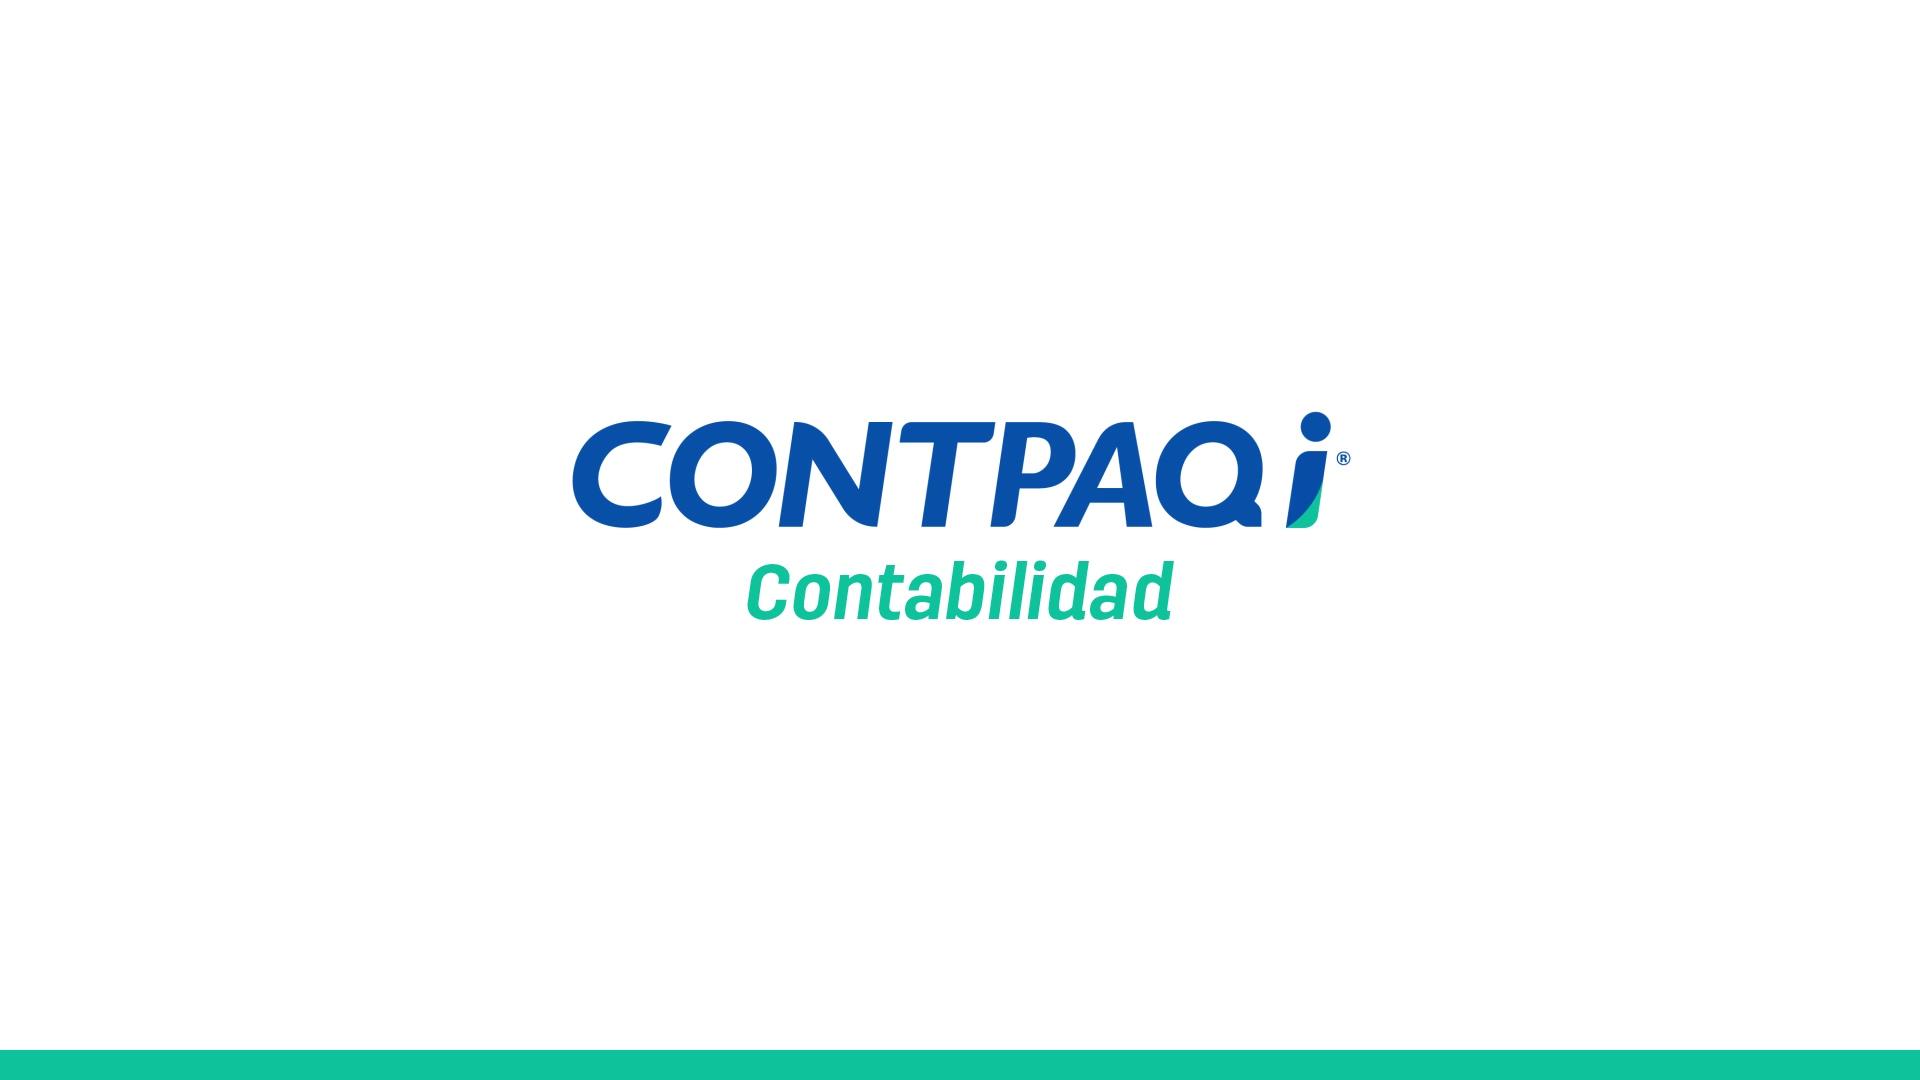 Contpaqi_Contabilidad_Demo